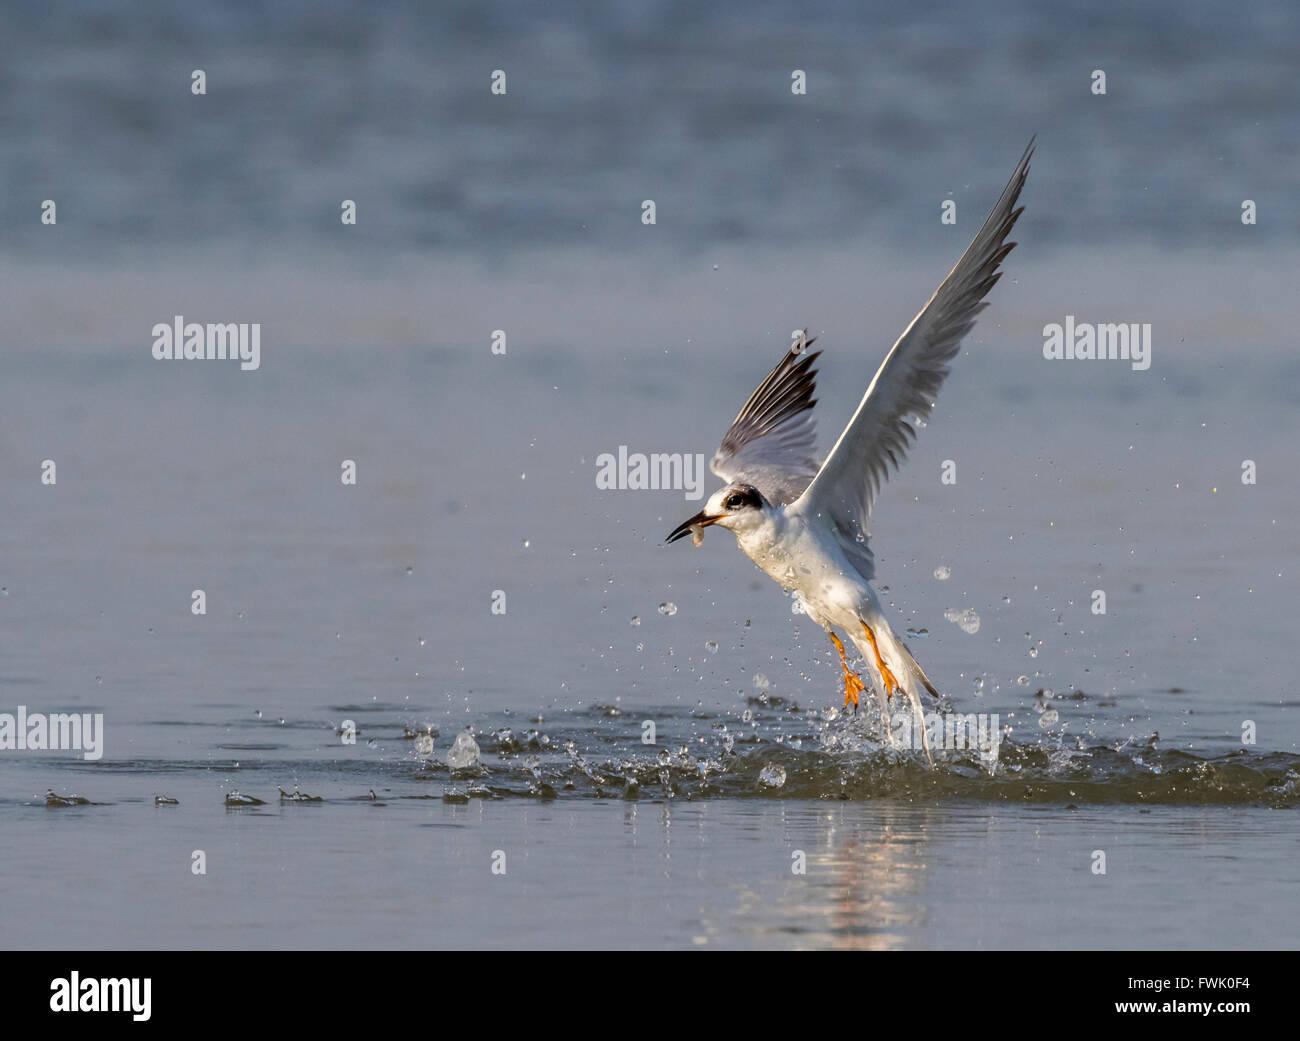 Forster's tern (Sterna forsteri) hunting in the ocean, Galveston, Texas, USA. - Stock Image